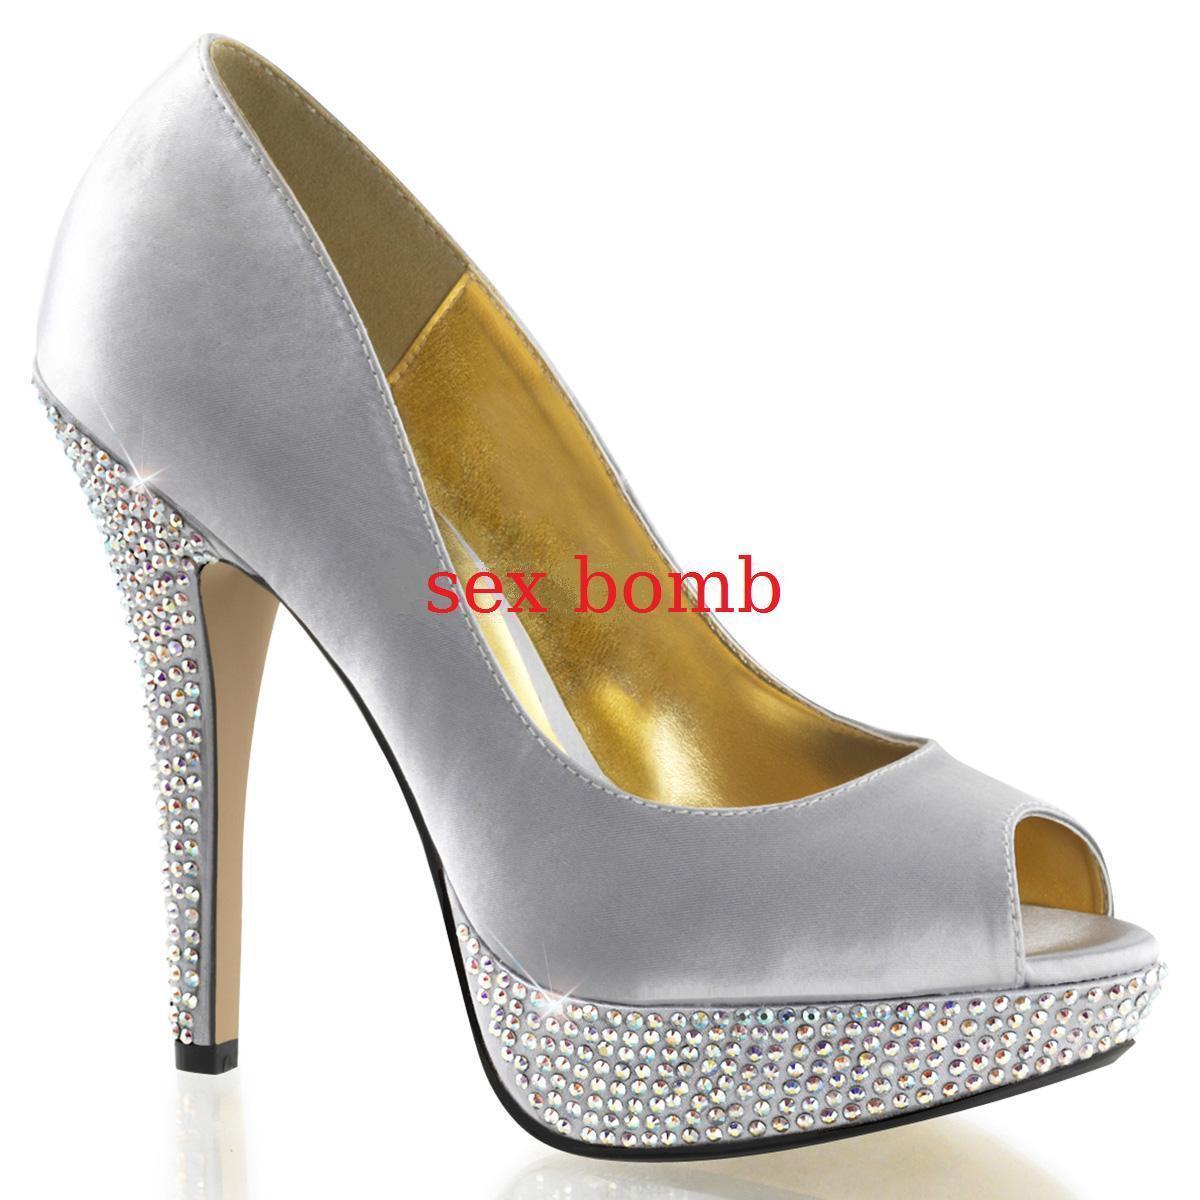 SEXY scarpe decolte STRASS plateau tacco 13 dal 35 al 41 ARGENTO fashion GLAMOUR